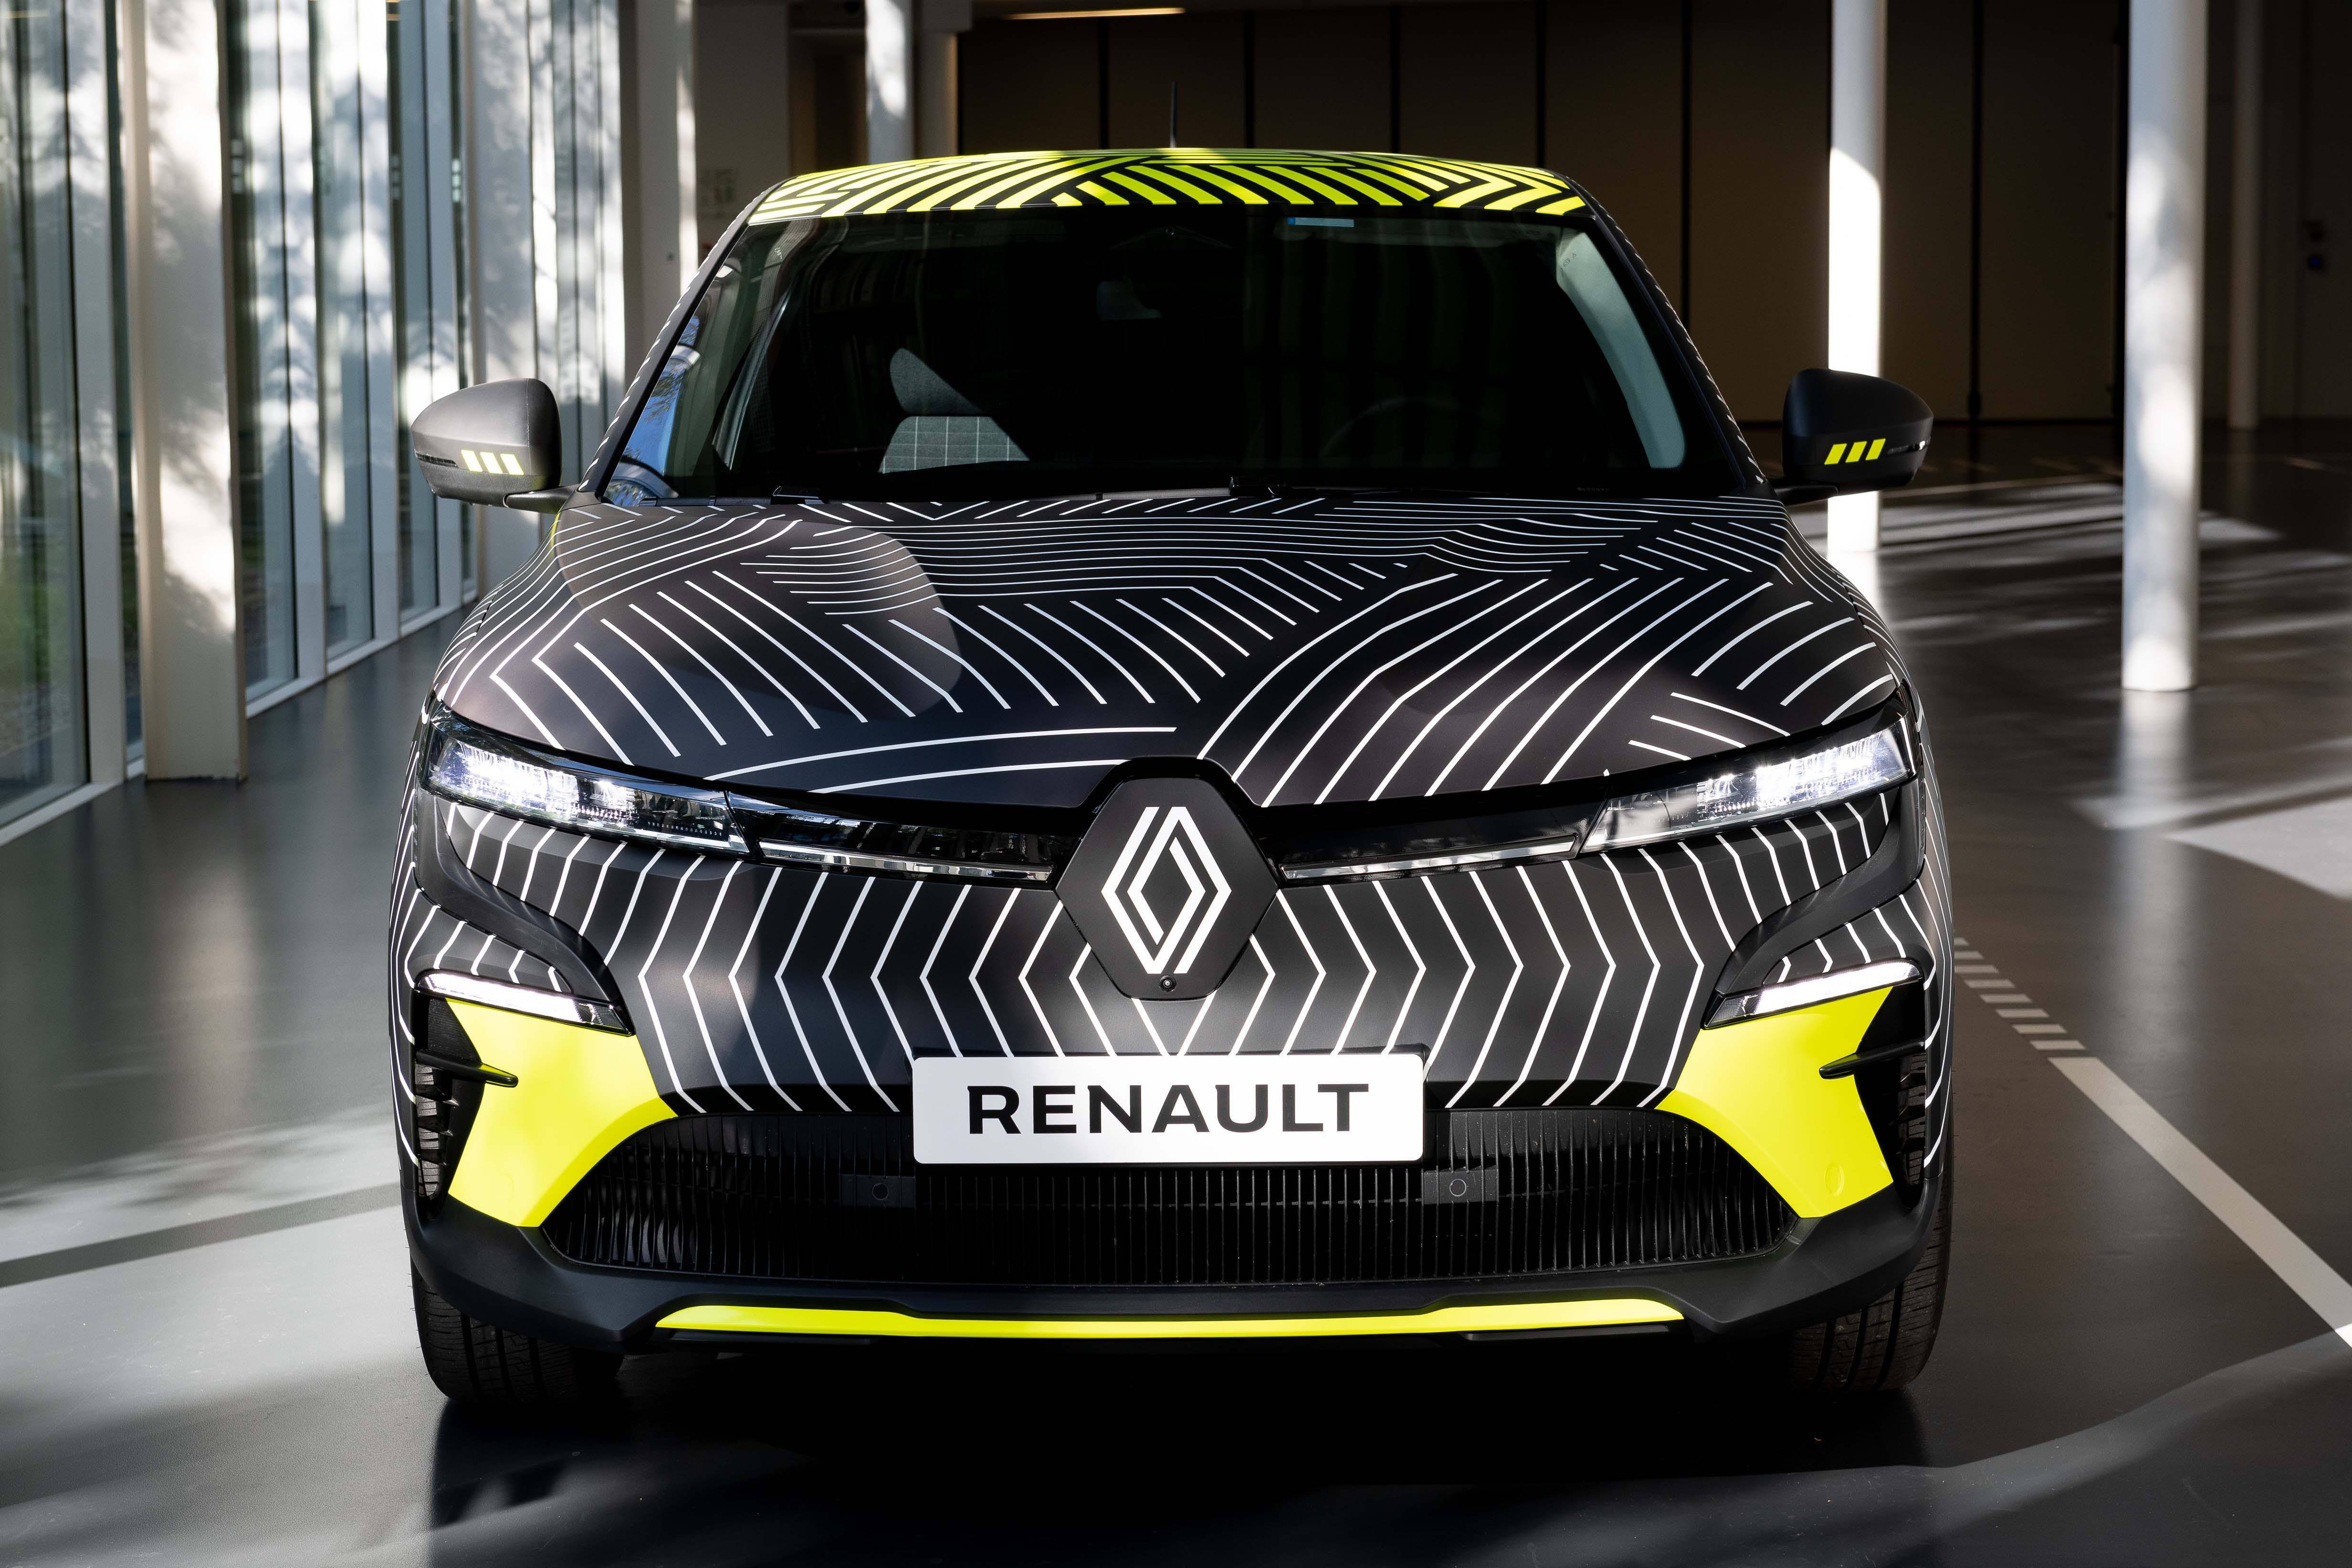 Atrāda Renault Mégane E-Tech Electric pirms ražošanas 3